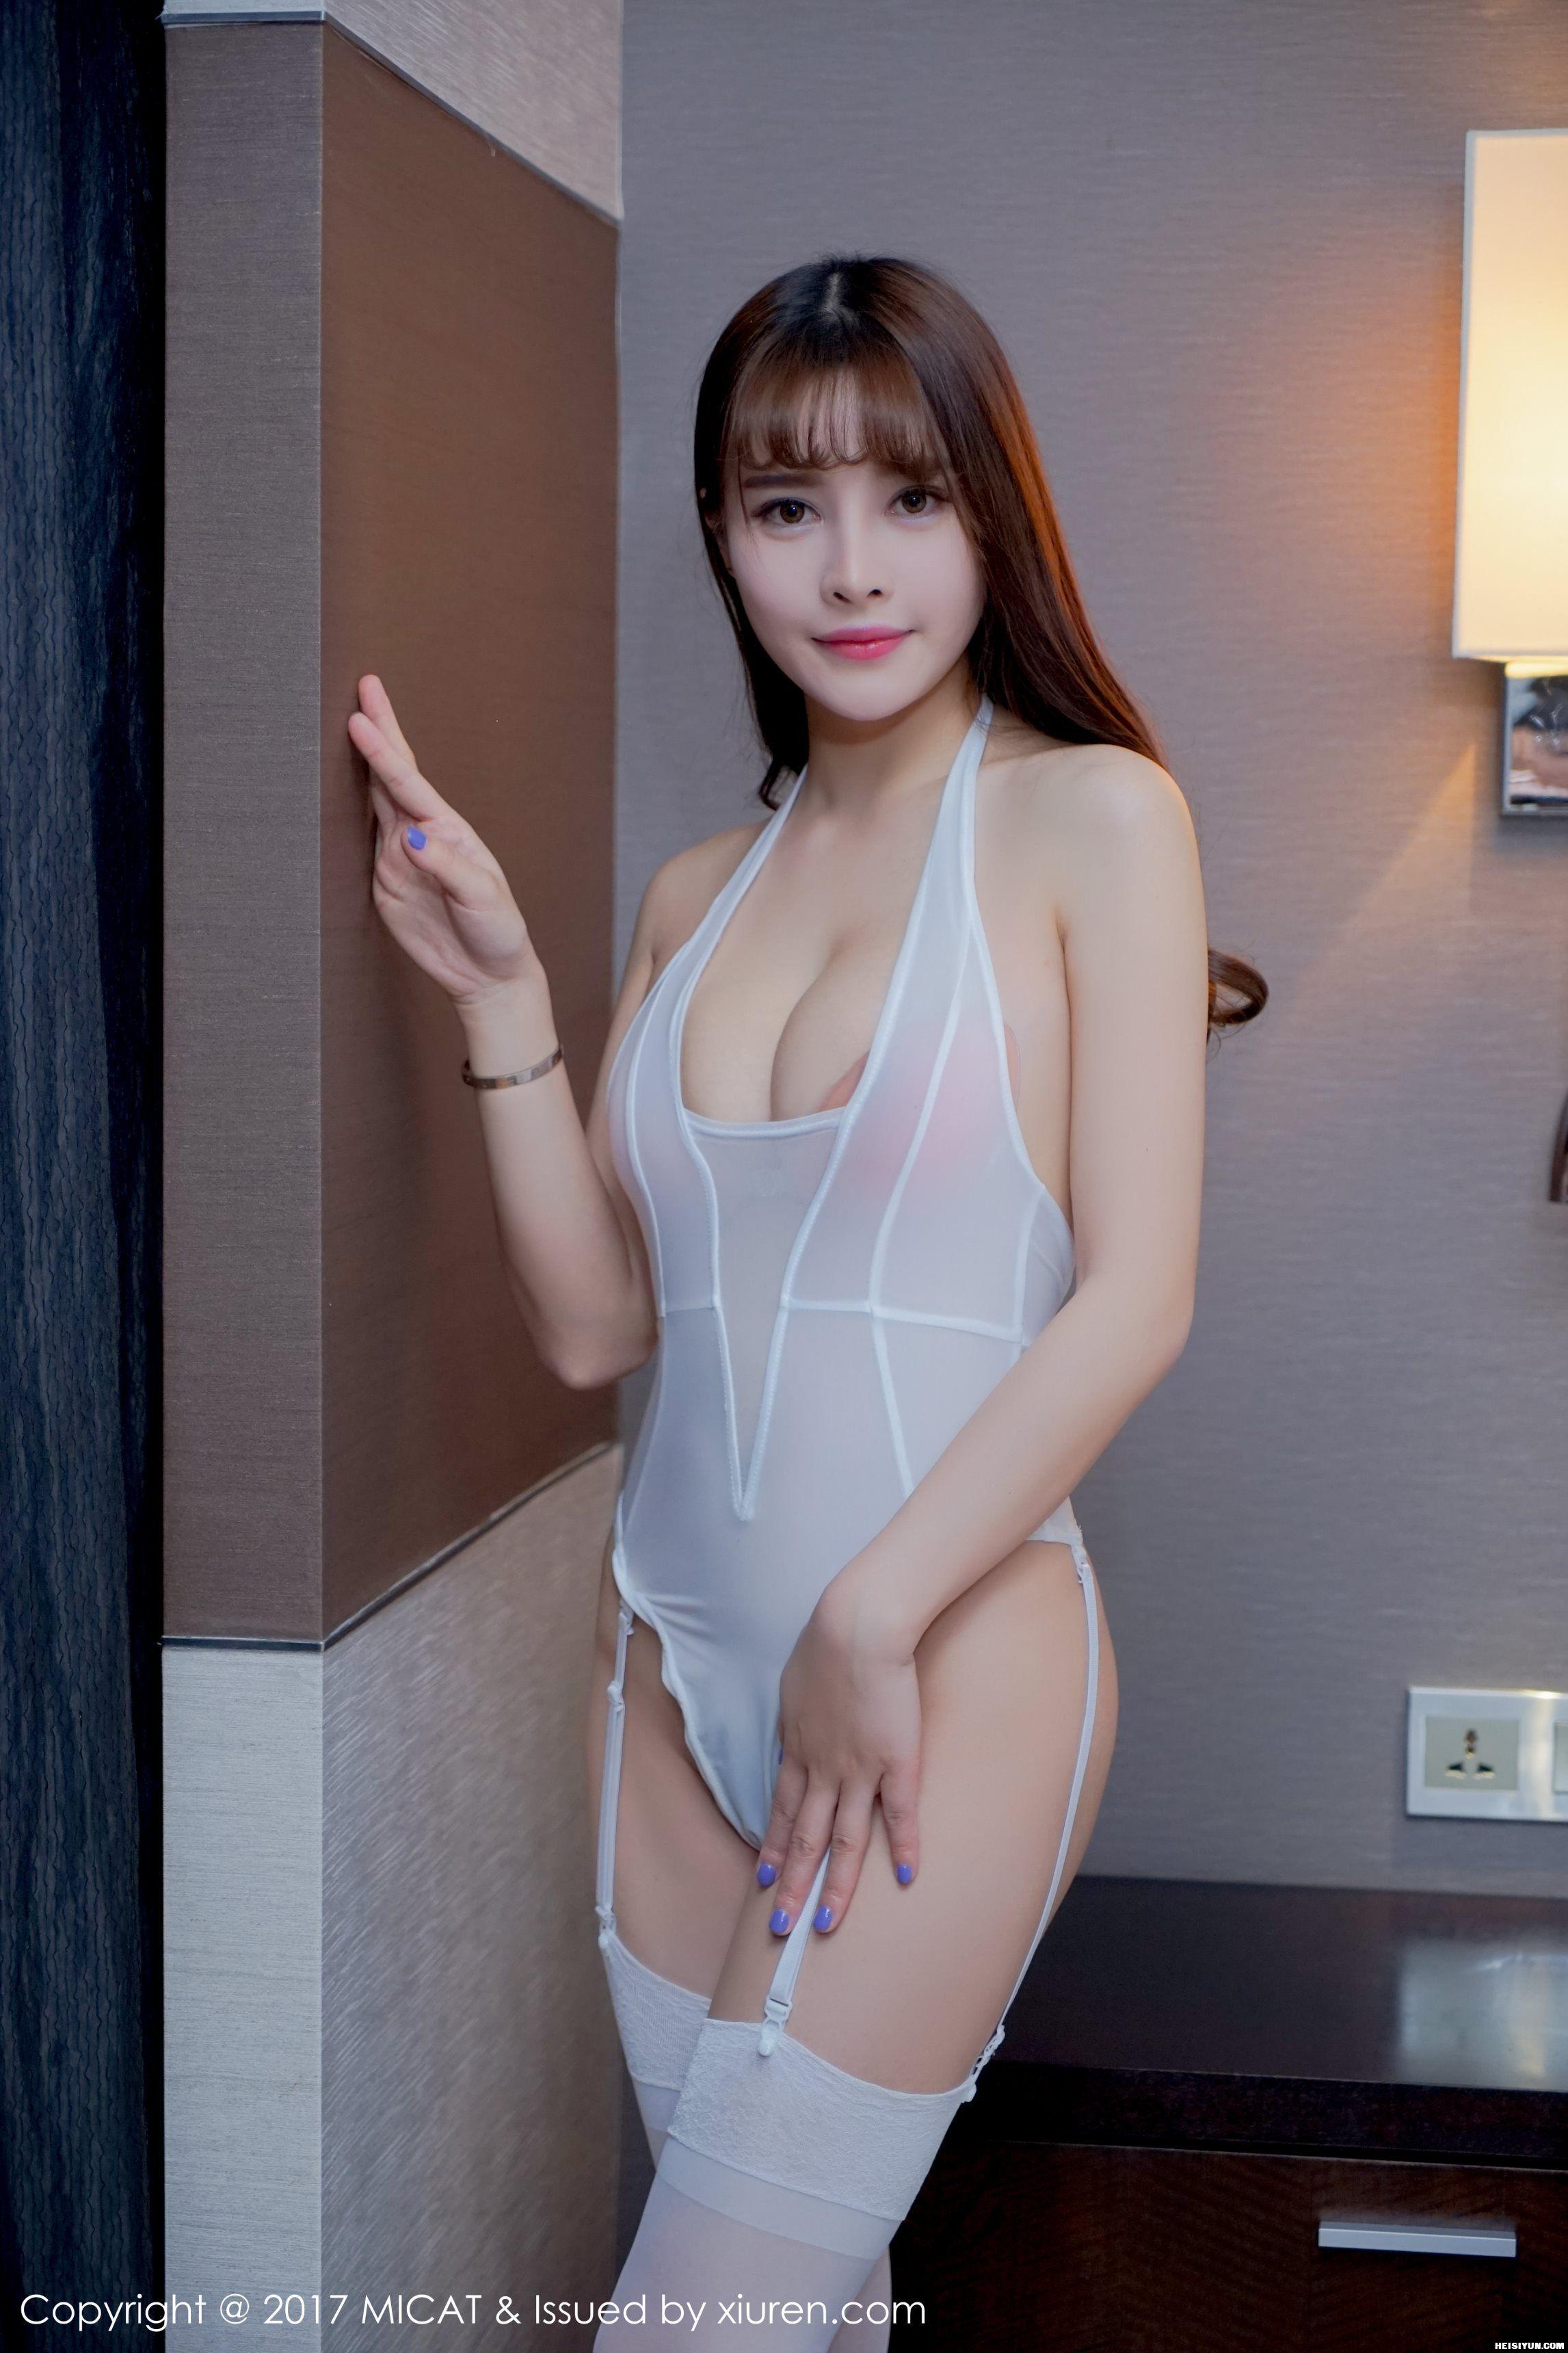 [MICAT猫萌榜] 2017.07.07 Vol.019 雪瑞Lisa [52+1P]